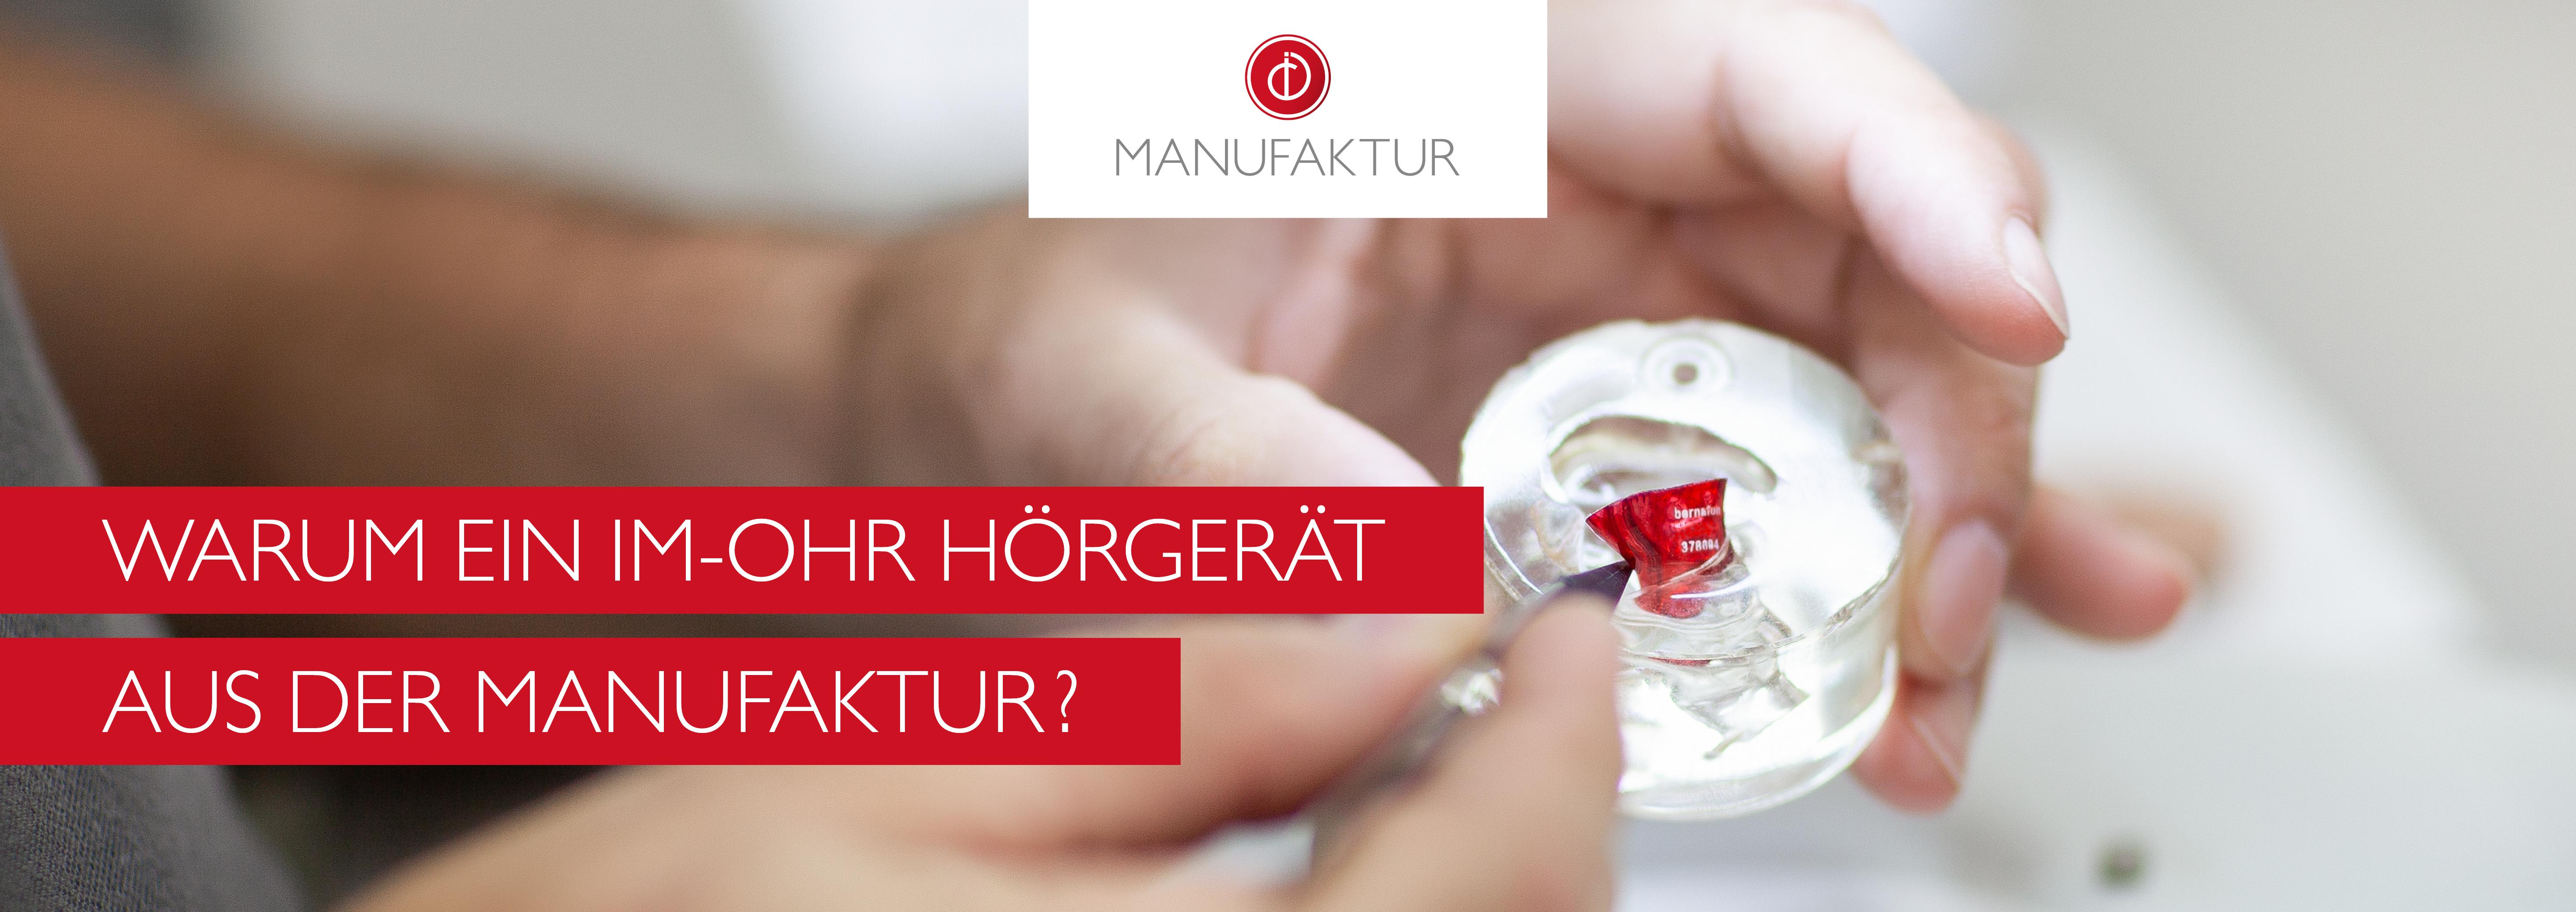 Bernafon Manufaktur - Warum ein Im-Ohr Hörgerät aus der Manufaktur?